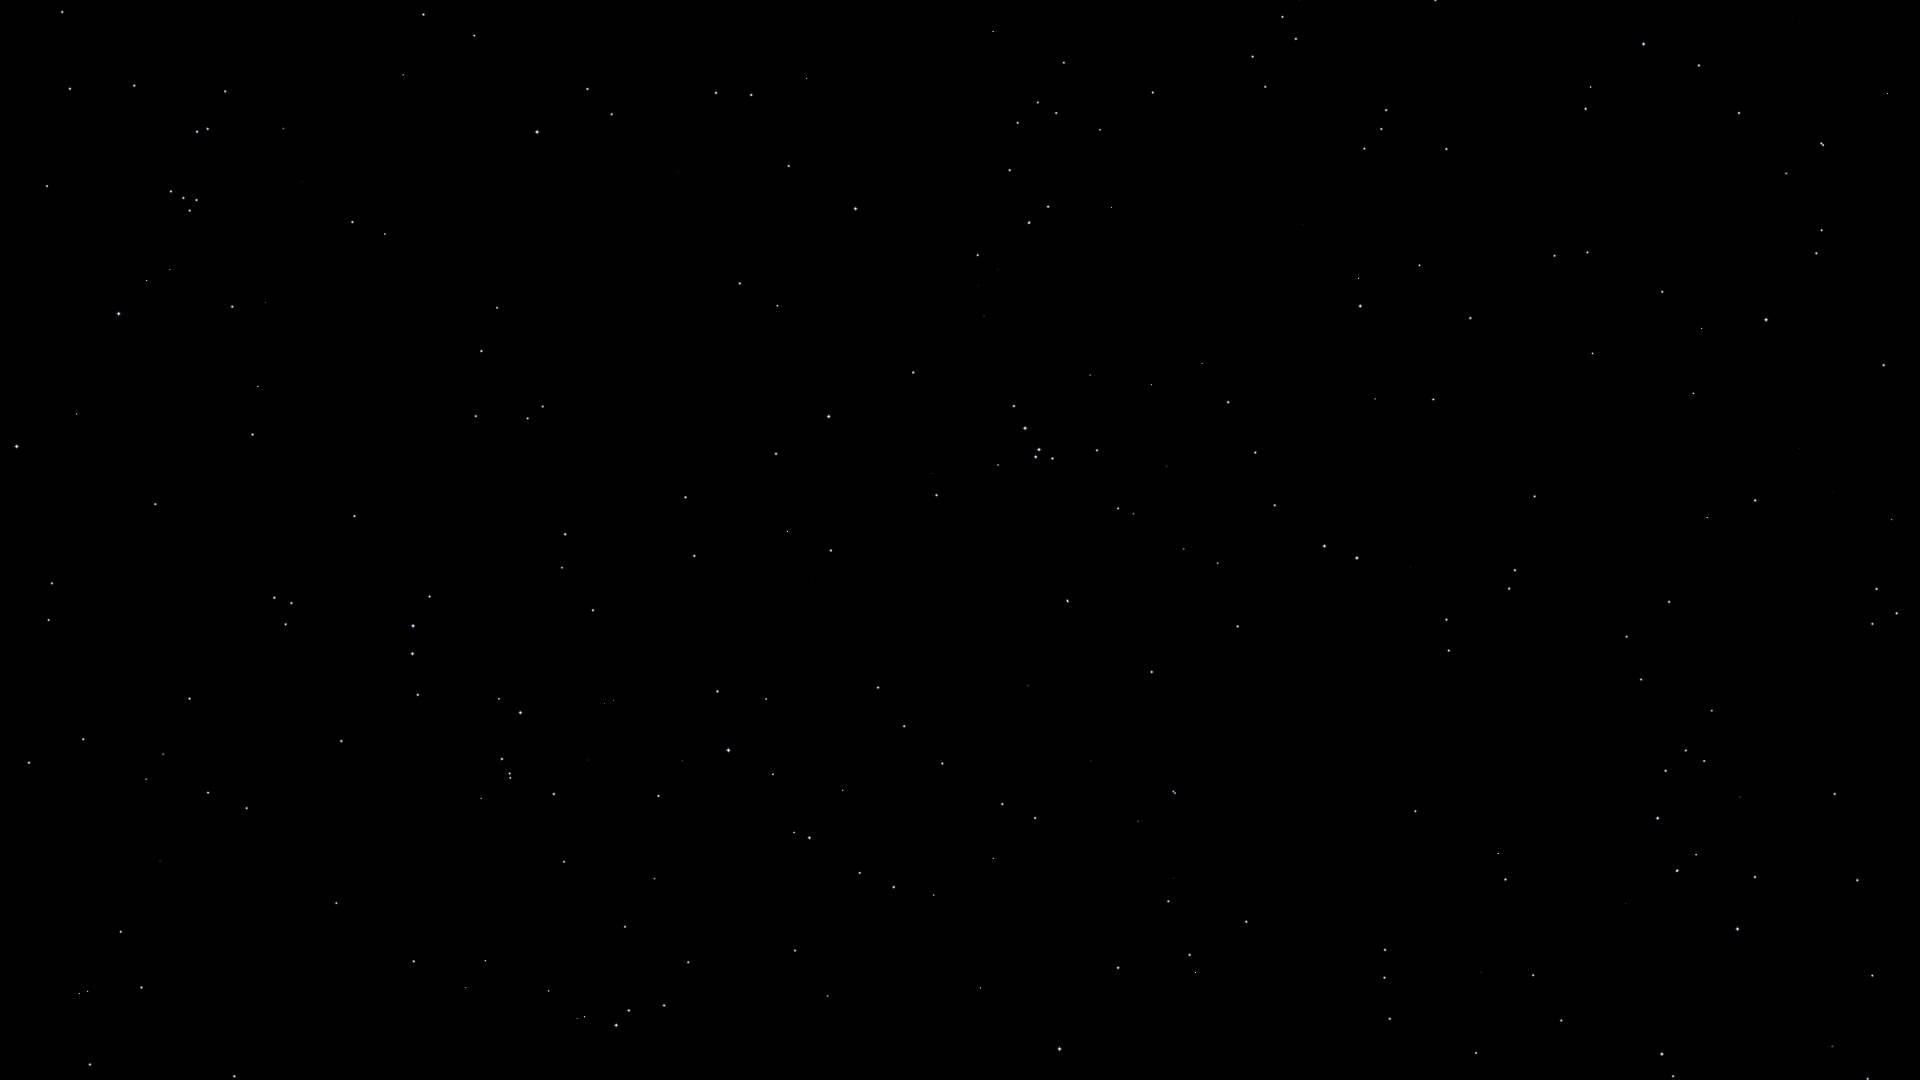 sky stars black background animation free footage hd - youtube